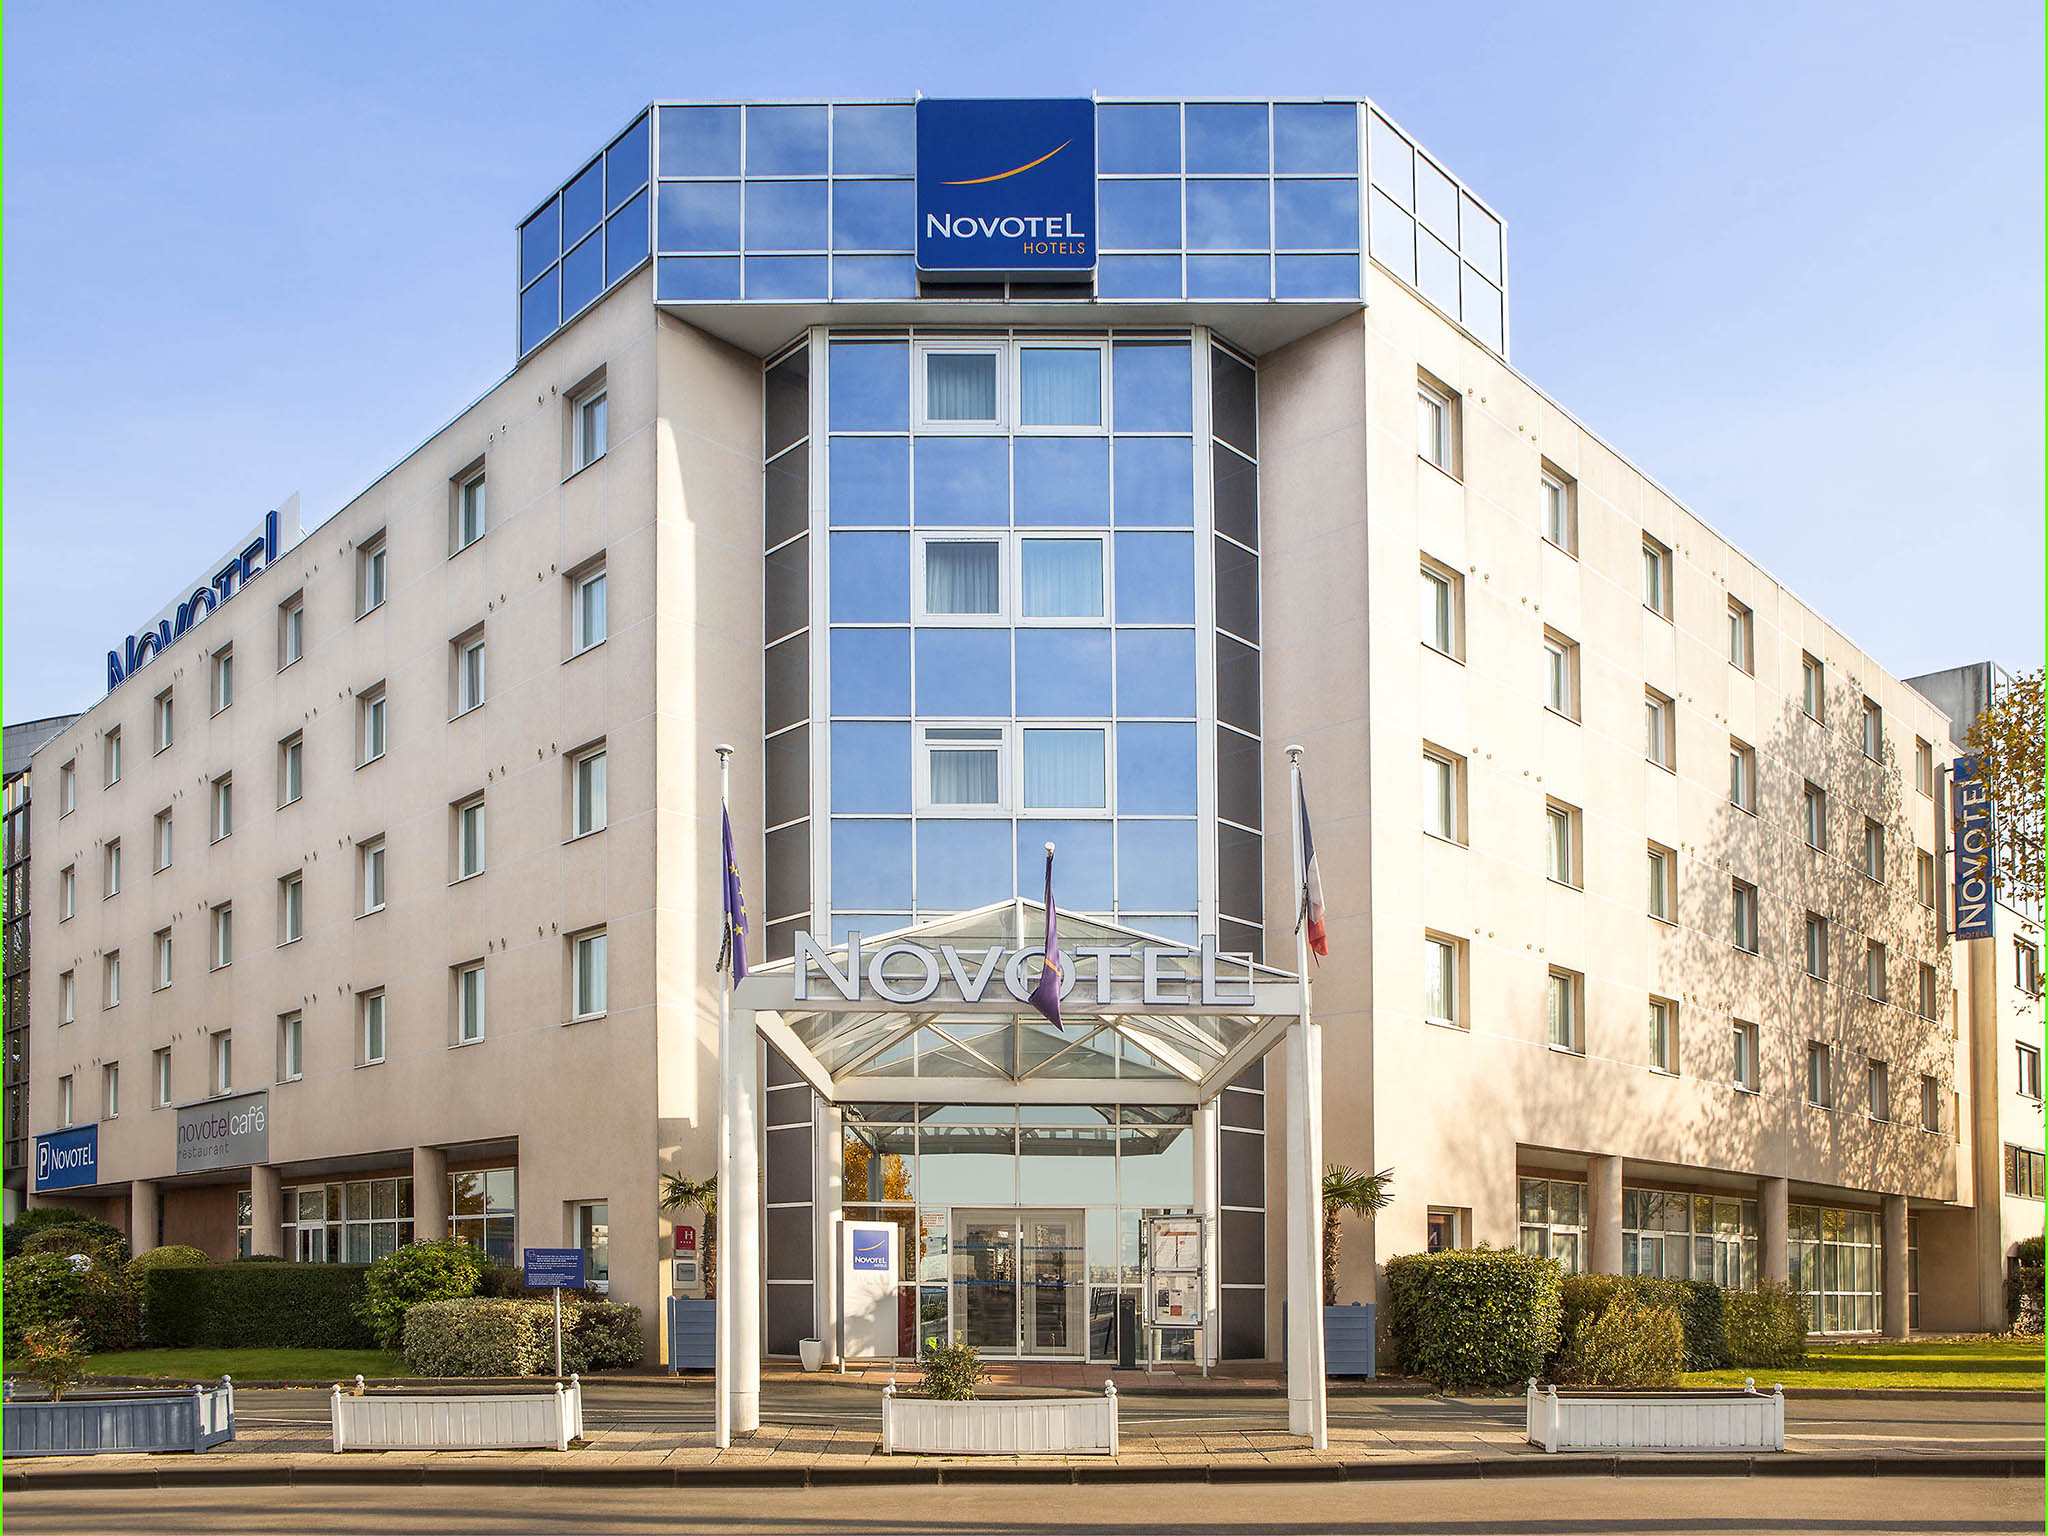 Hotel – Novotel Nantes Centre Bord de Loire